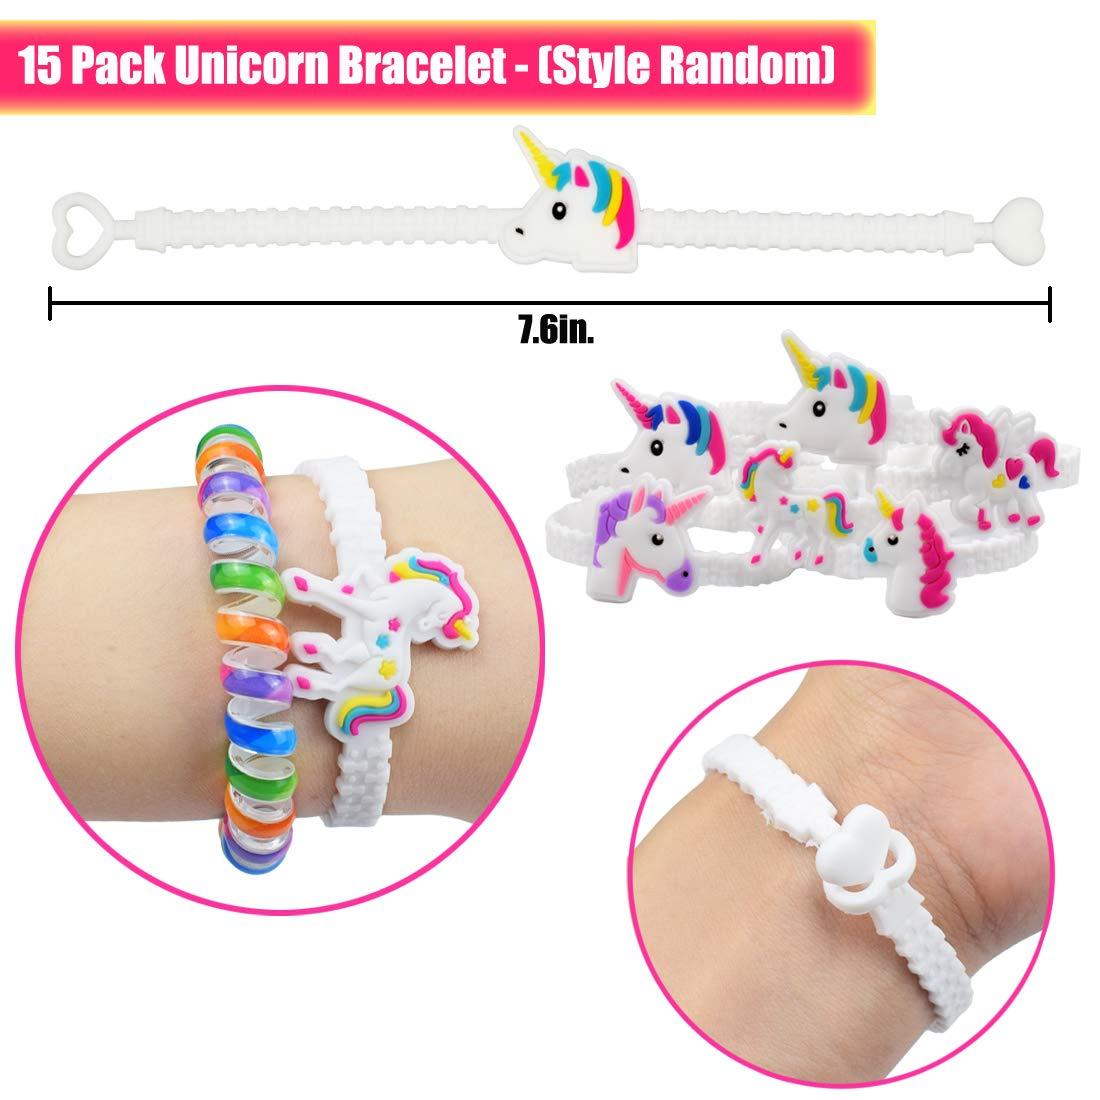 Carnival Prize Rainbow Unicorn Kids Birthday Party Favors Goodie Bag Fillers for 5 Girl Unicorn Headband Danirora Unicorn Party Supplies, 55 Pack